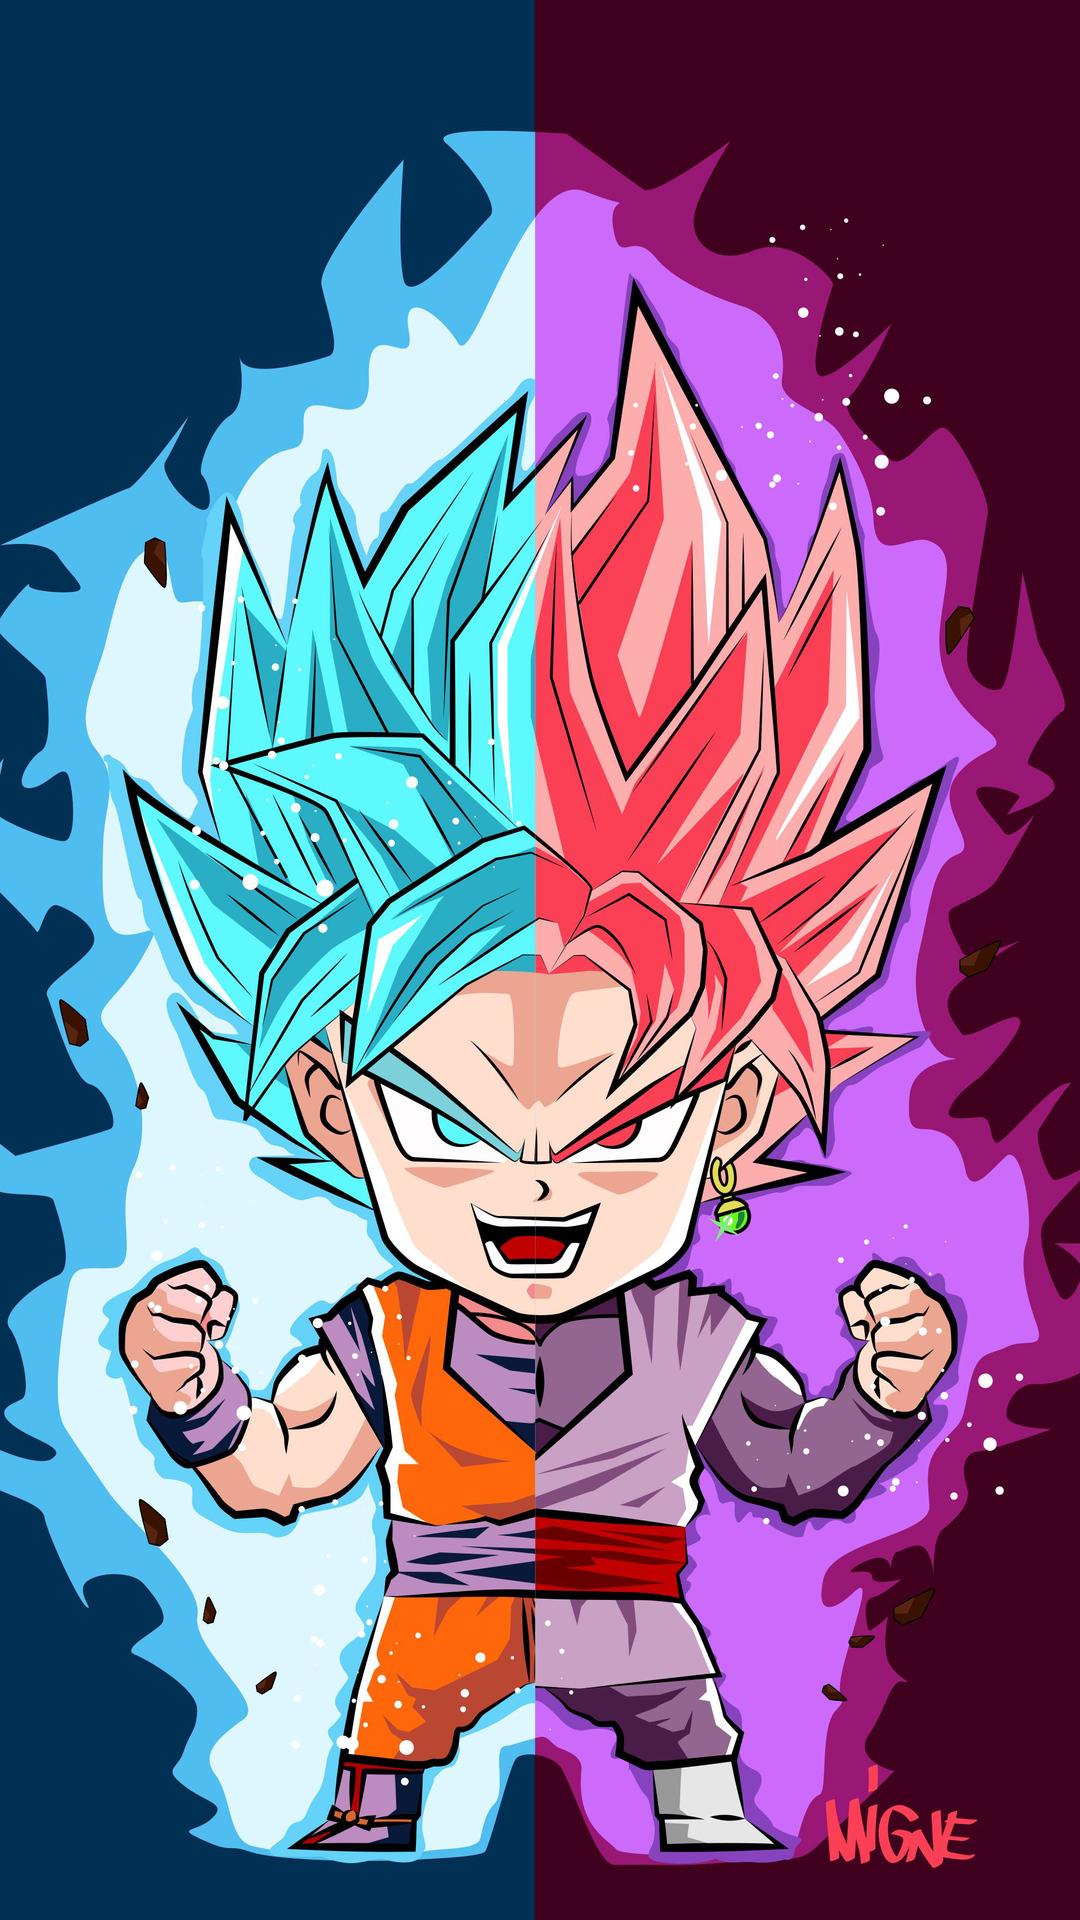 1080x1920 Dragon Ball Super Art 4k Iphone 76s6 Plus Pixel